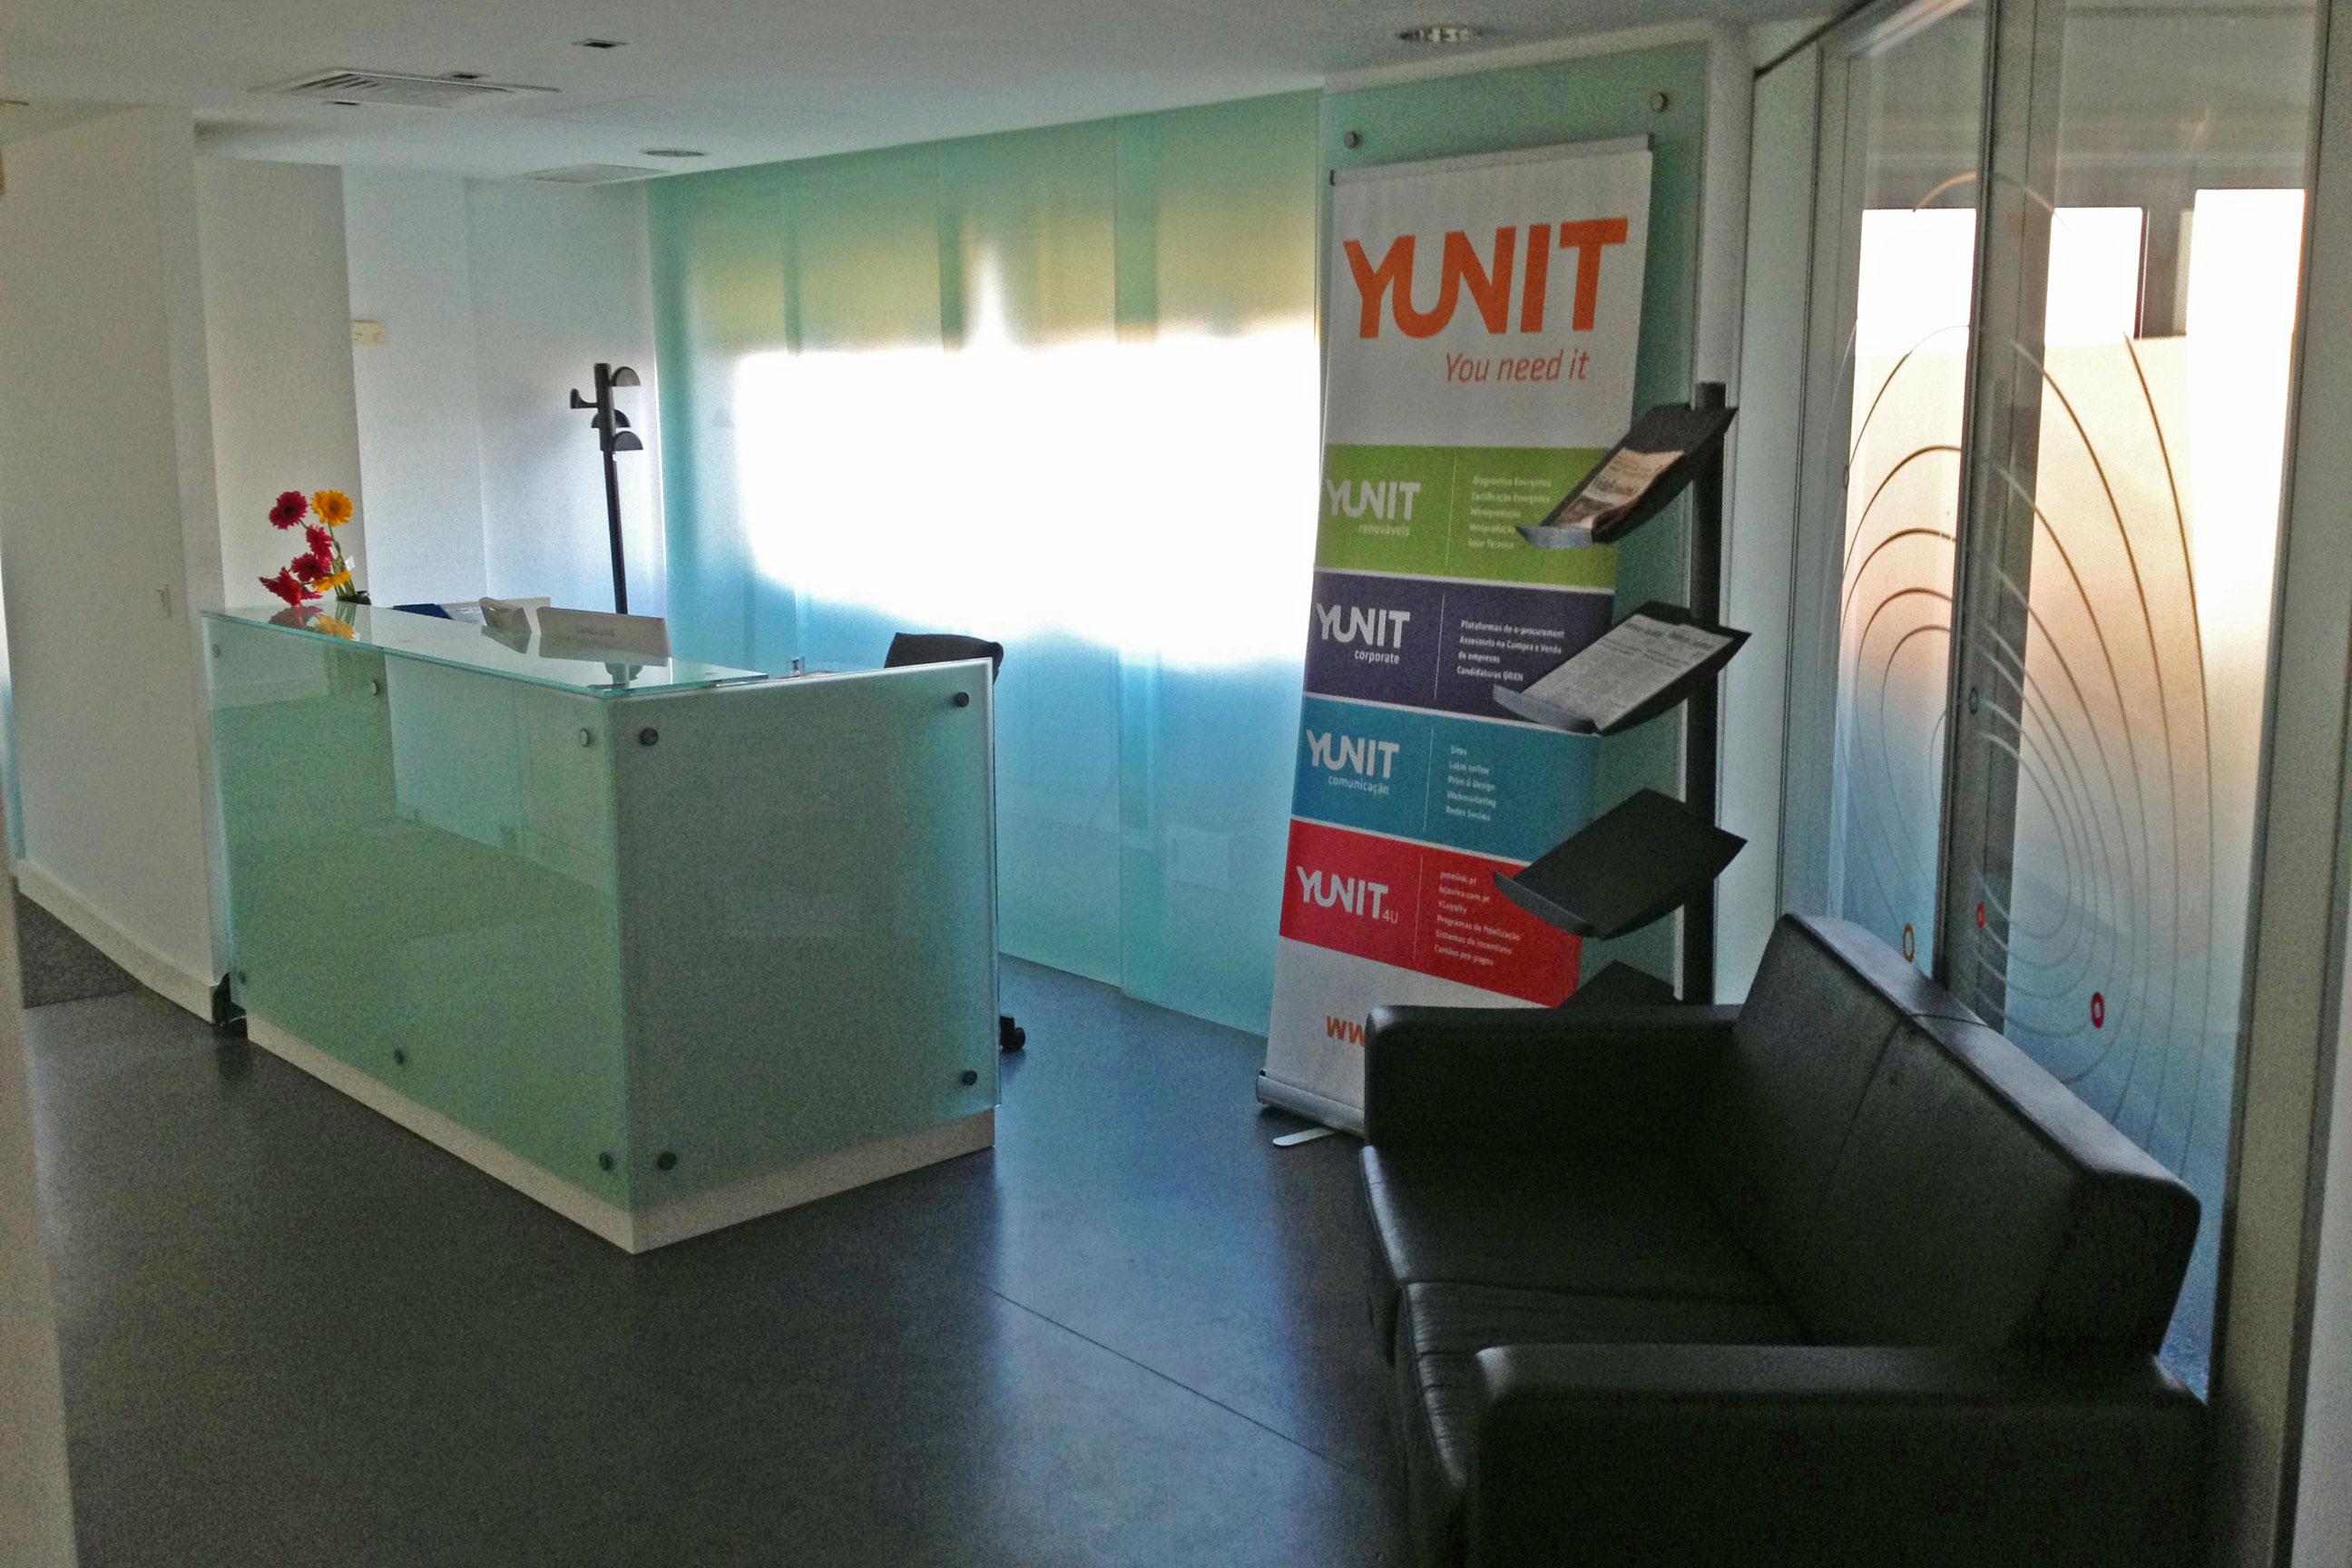 Yunit-1